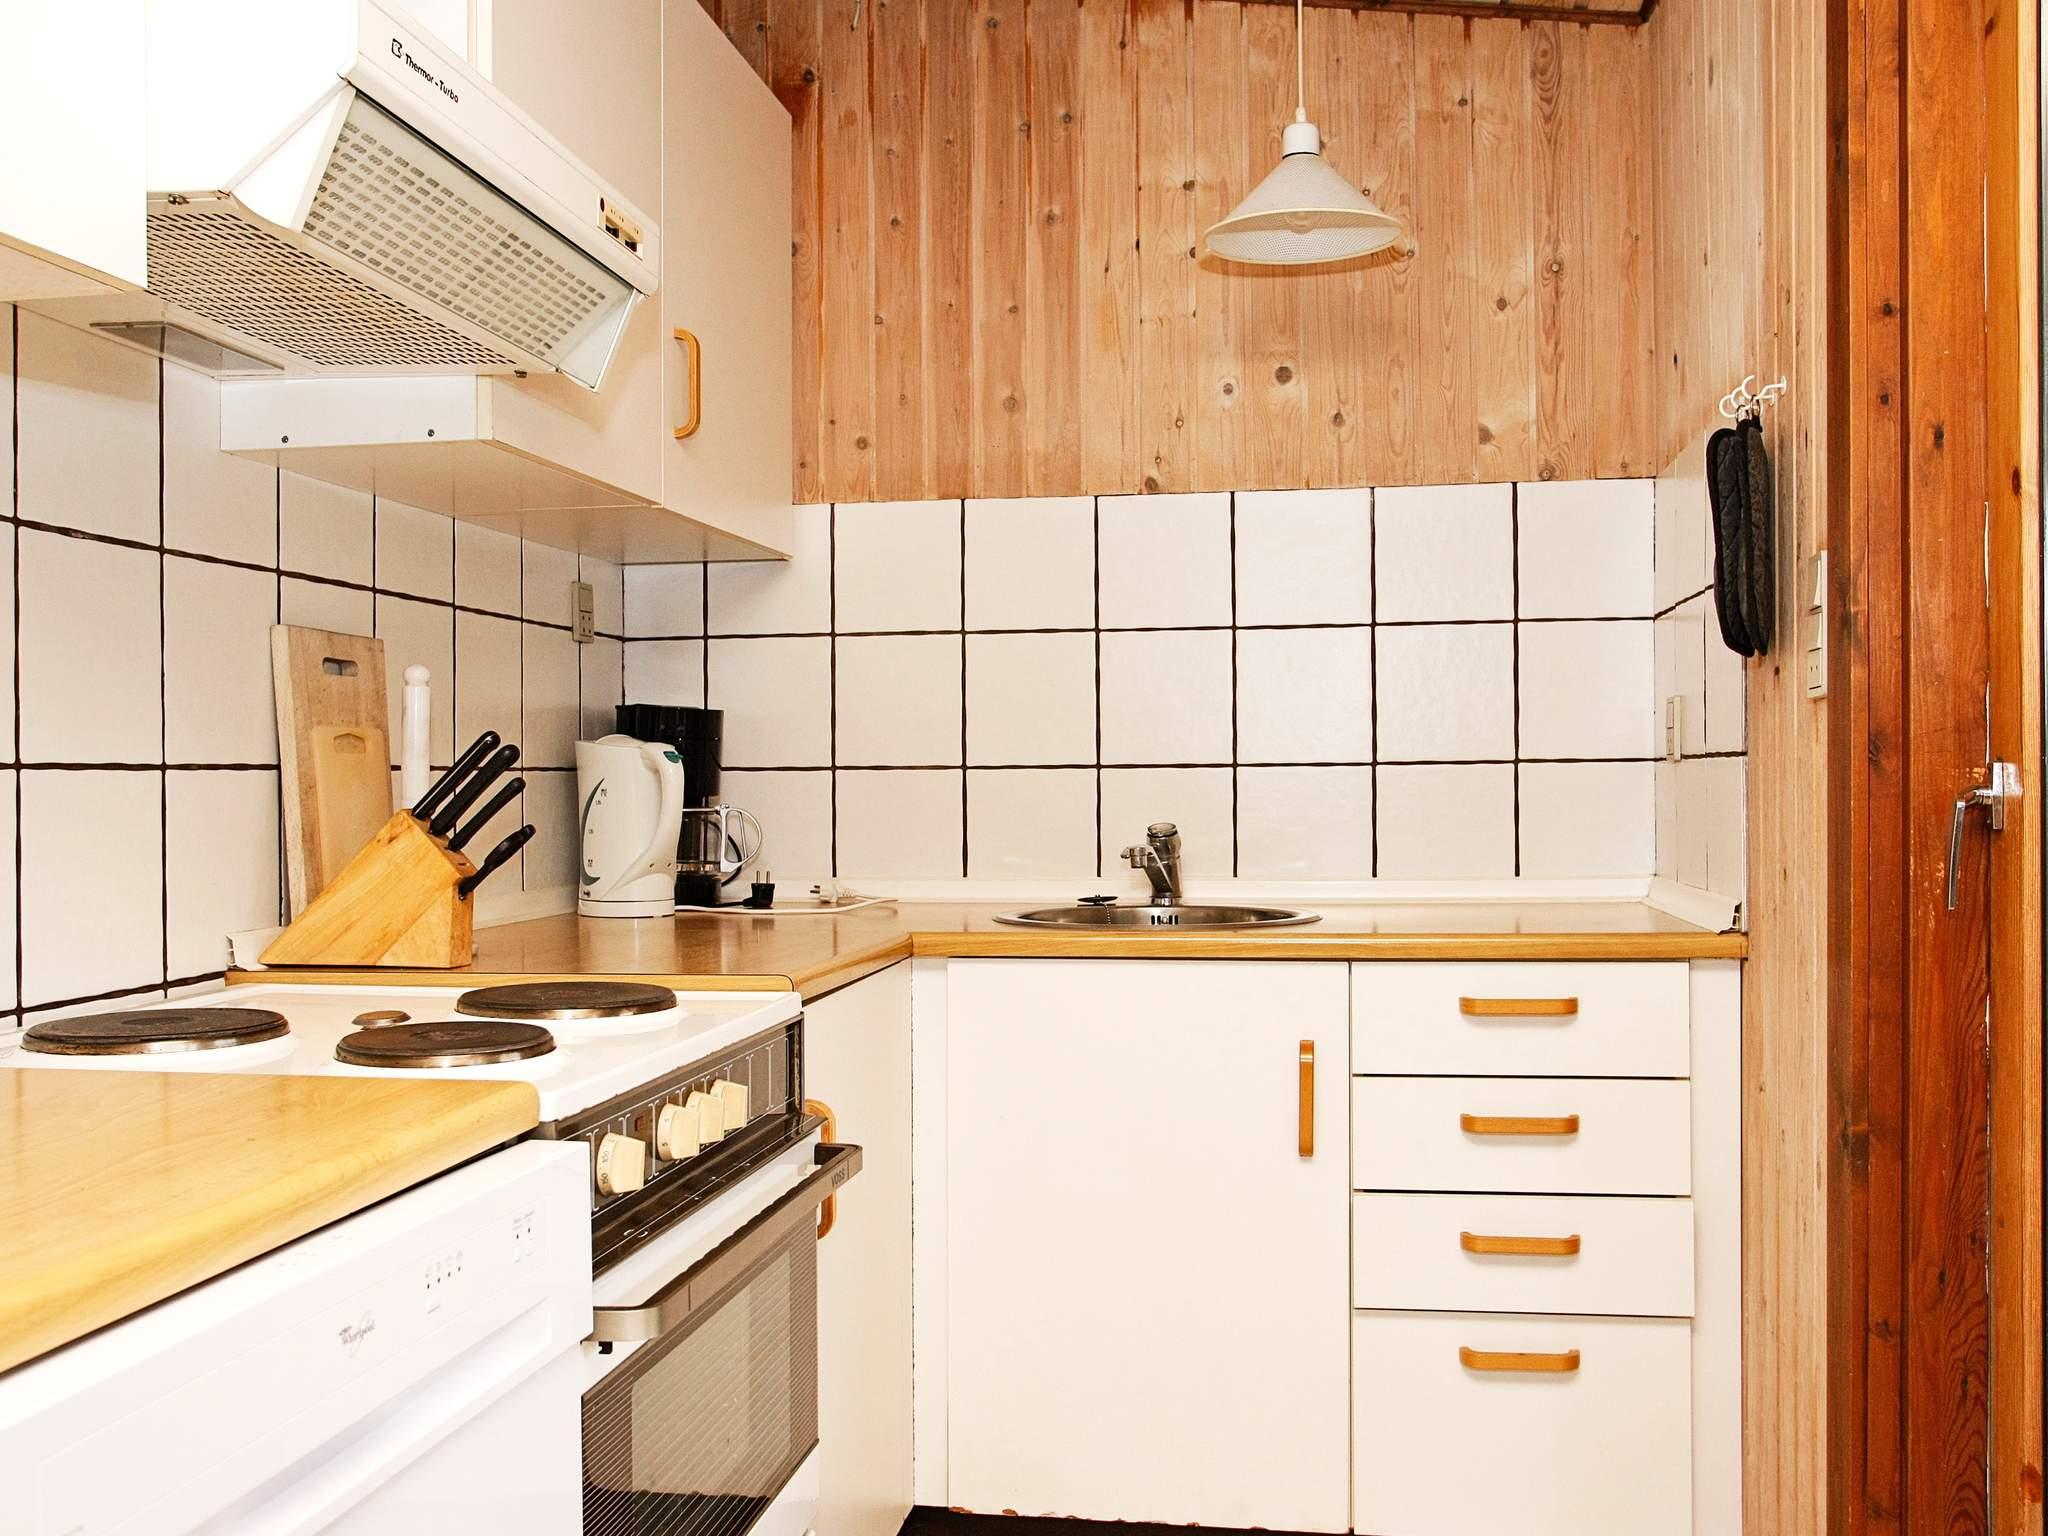 Ferienhaus Nr. Lyngby (89563), Løkken, , Nordwestjütland, Dänemark, Bild 4